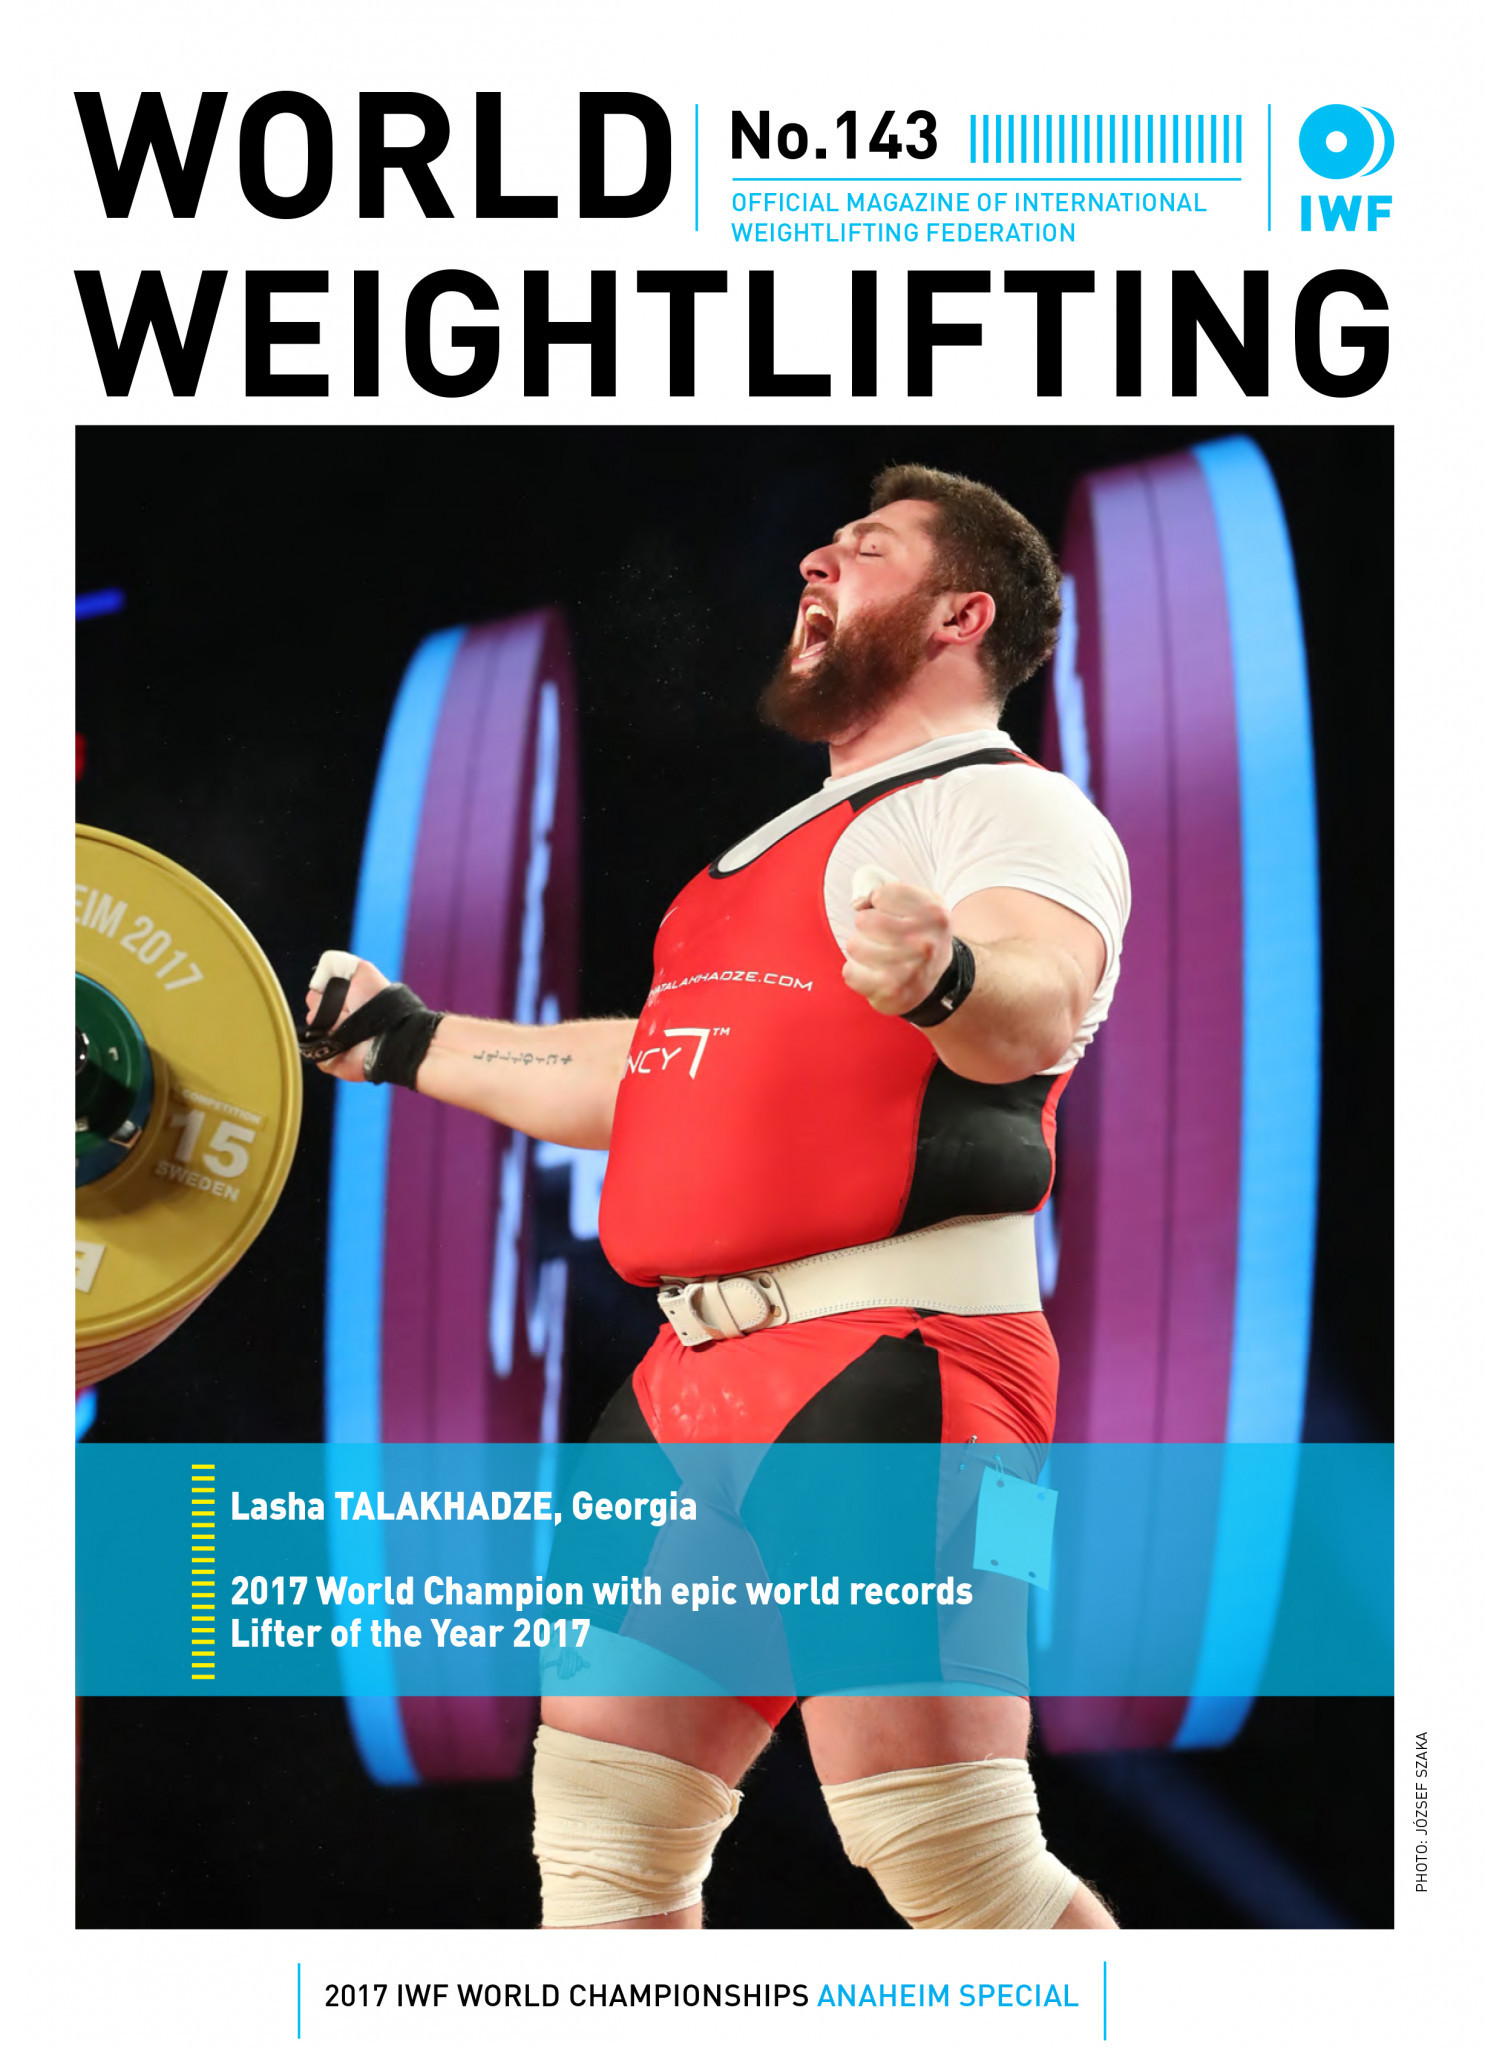 World Weightlifting Magazine No. 143